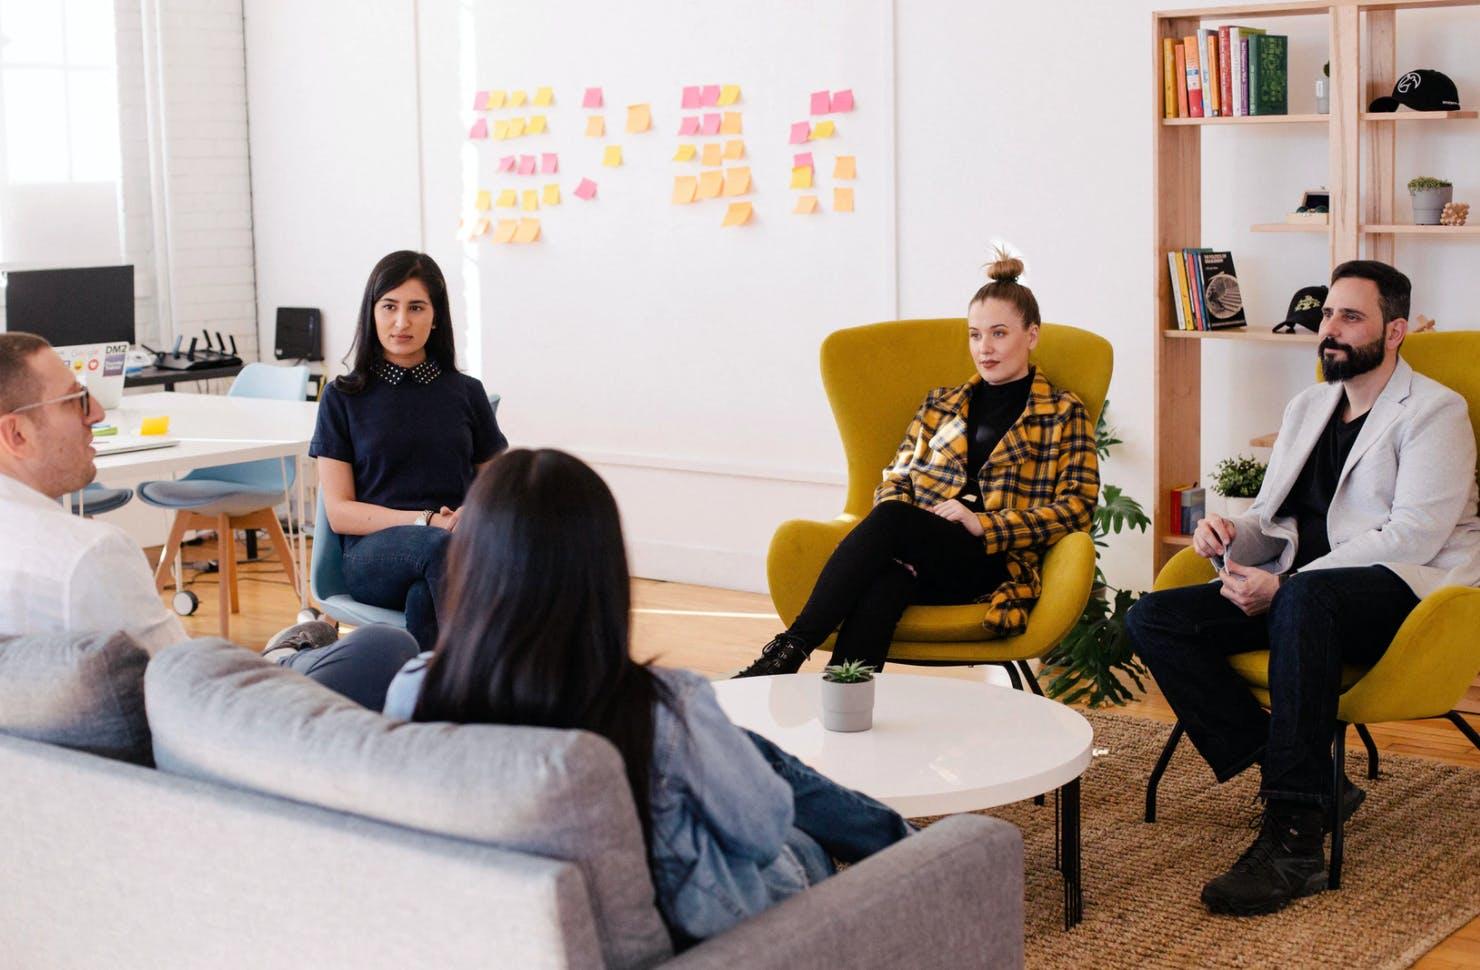 design team discussing process documentation